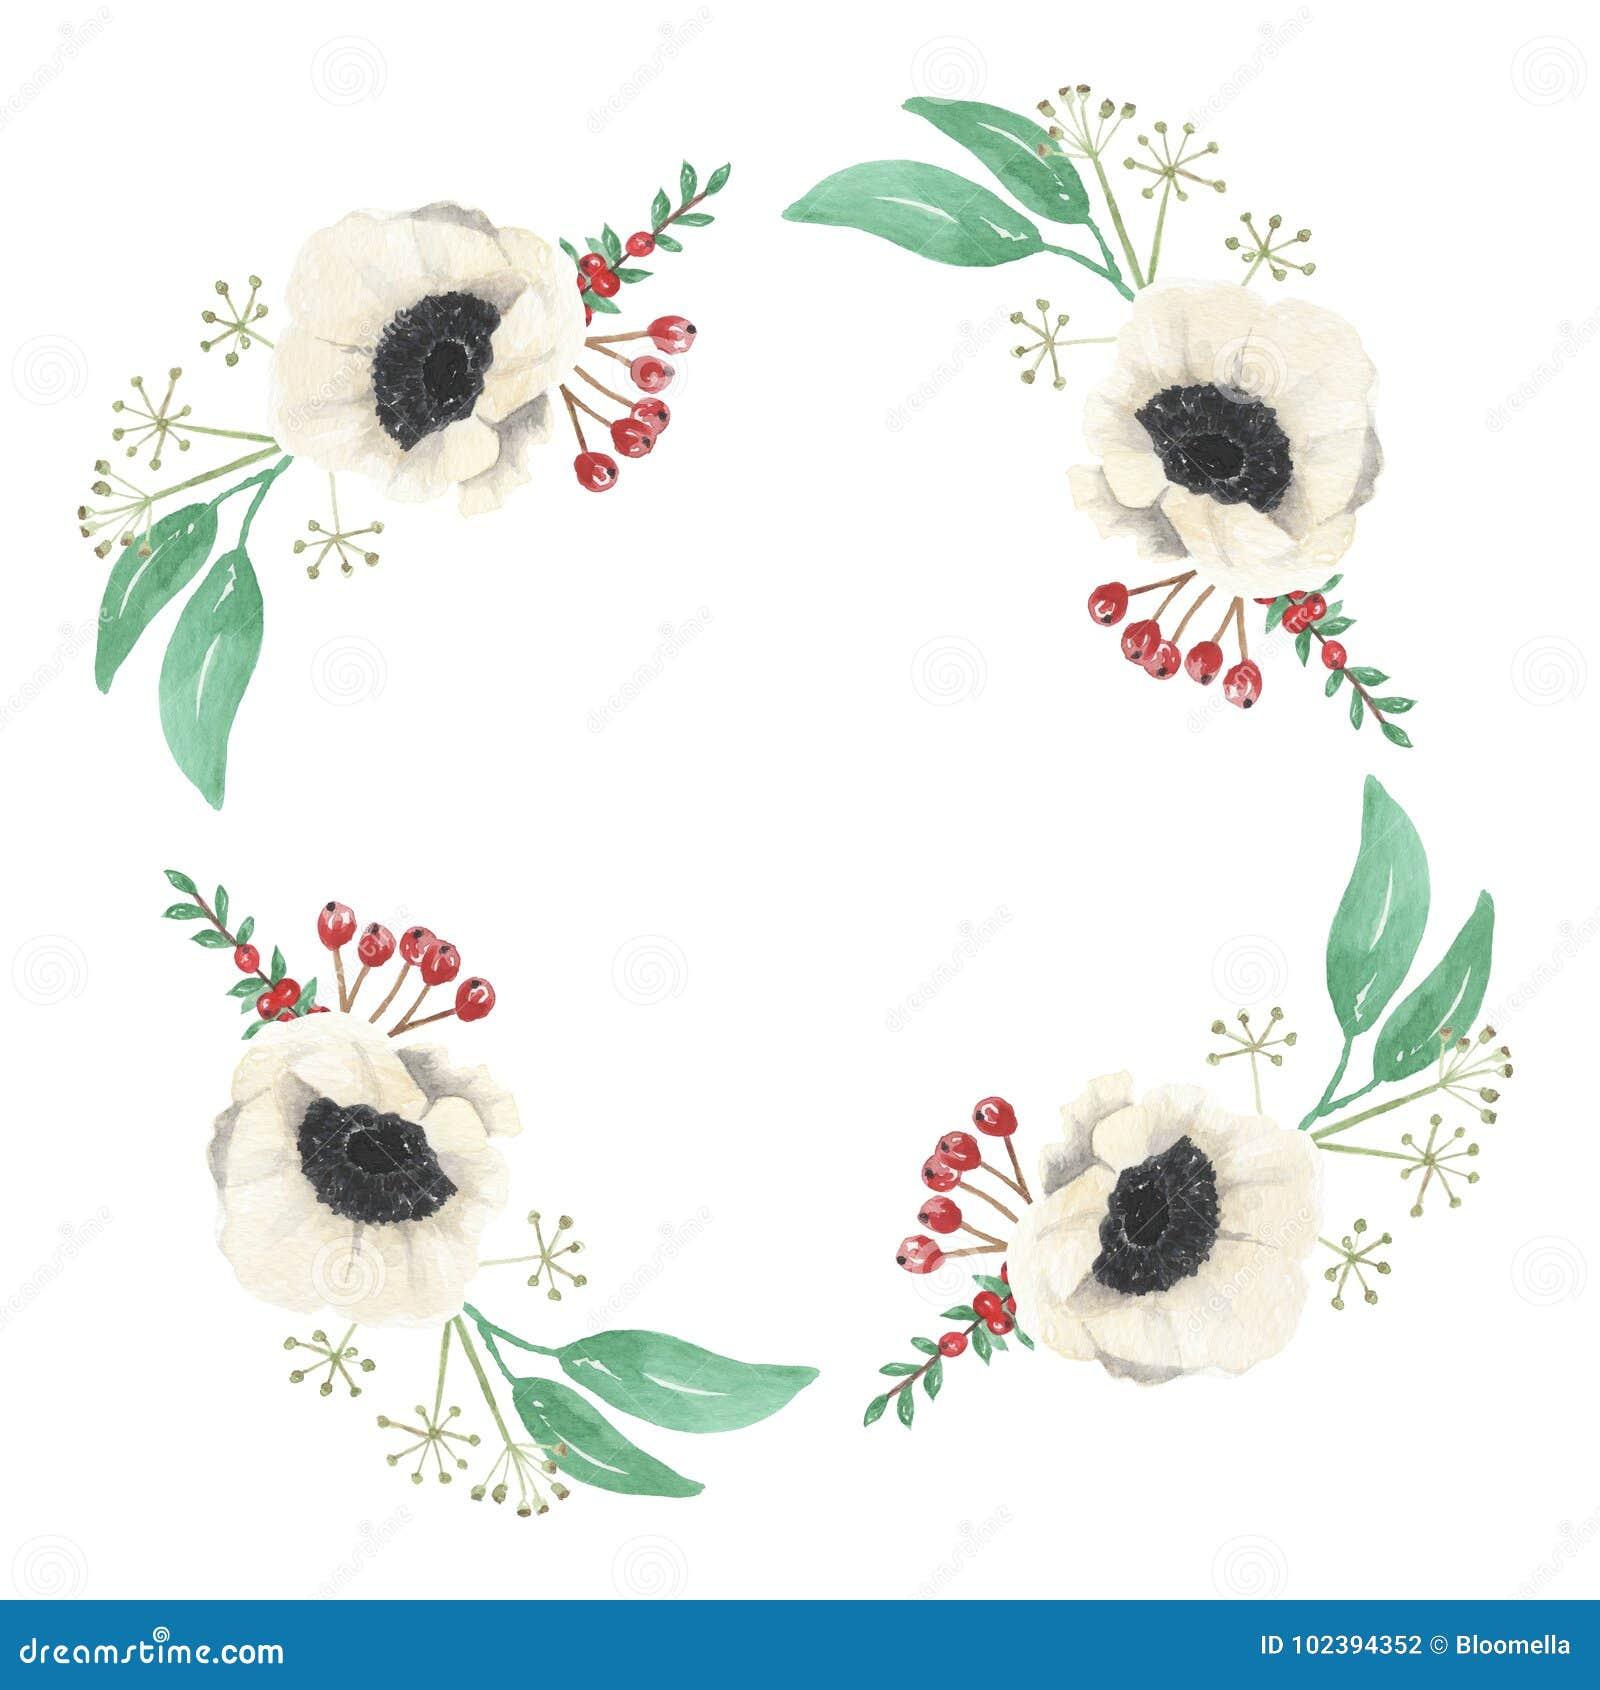 Watercolor Christmas Flower Leaves Berries Festive Wreath Border